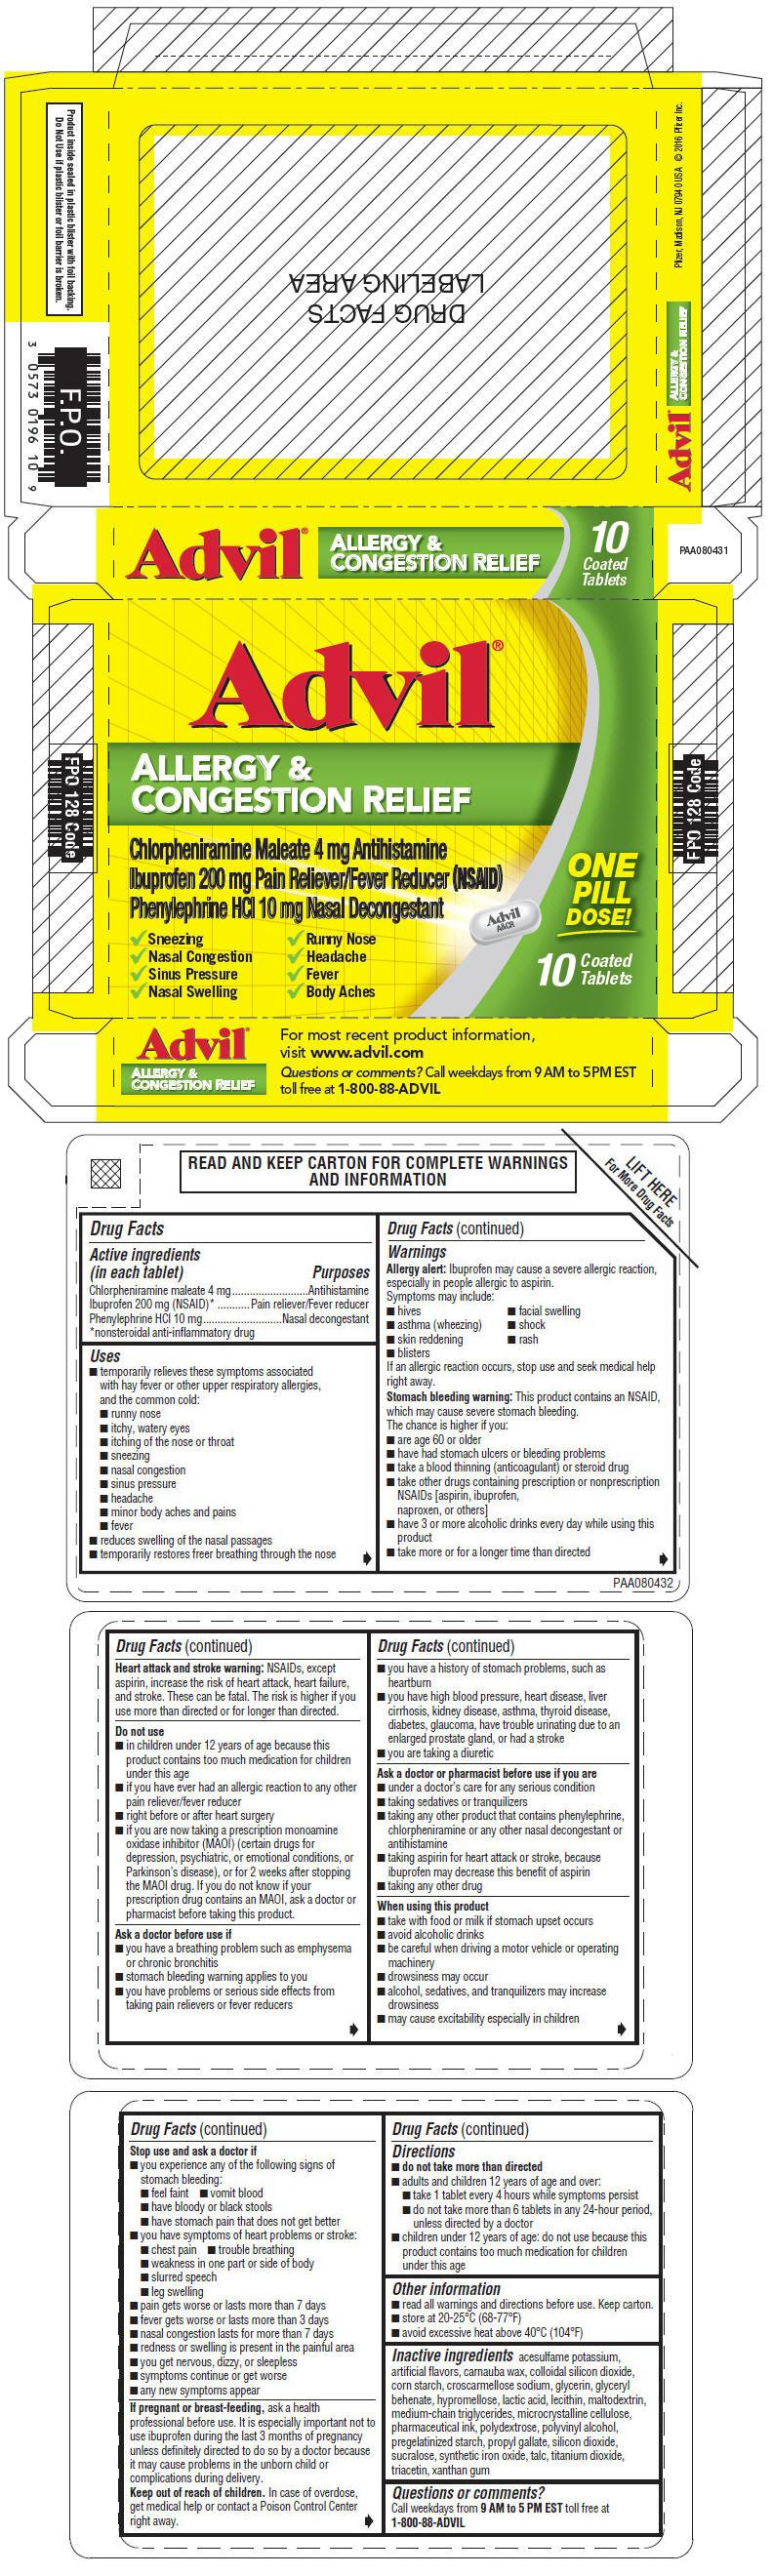 PRINCIPAL DISPLAY PANEL - 10 Tablet Blister Pack Carton